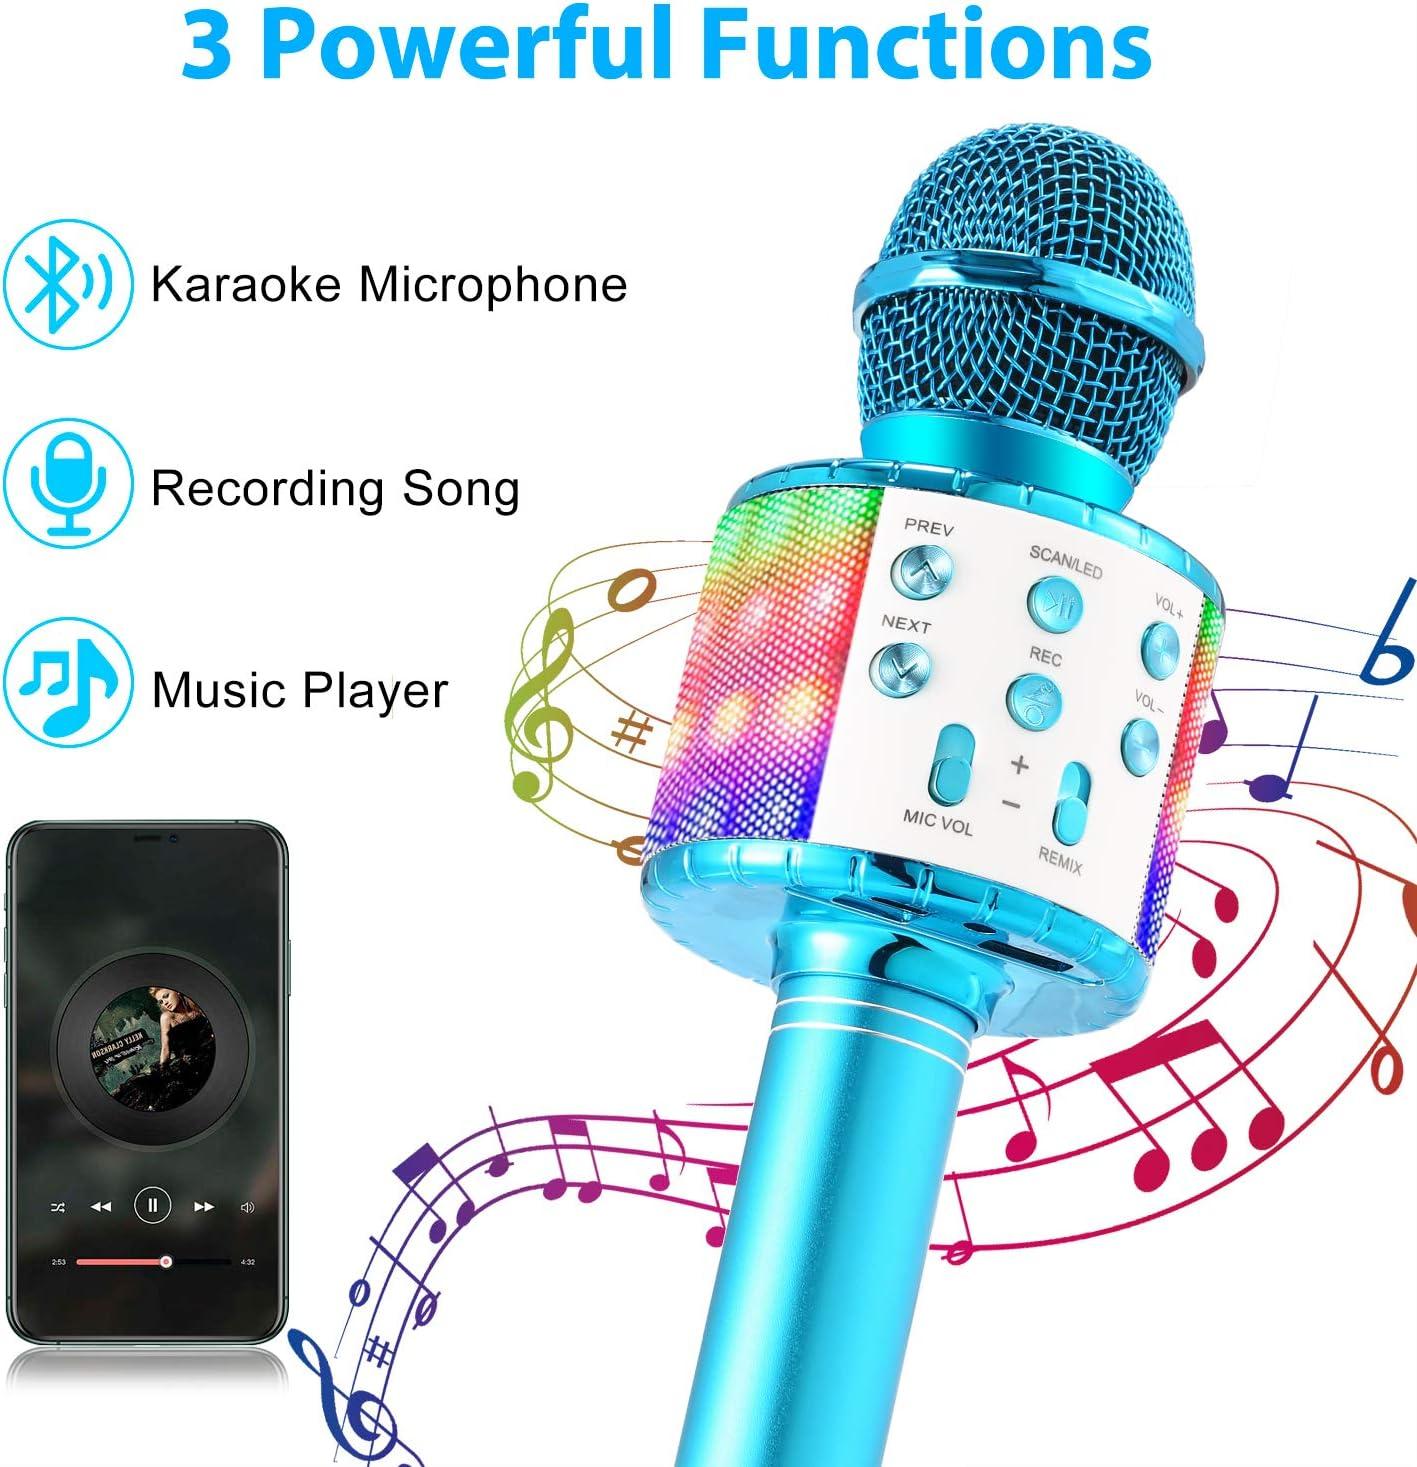 Fede Micrófono Karaoke Bluetooth, Microfono Inalámbrico Karaoke Portátil con luz LED multicolor para Niños Canta Partido Musica, Compatible con Android/iOS PC o Teléfono Inteligente: Amazon.es: Instrumentos musicales